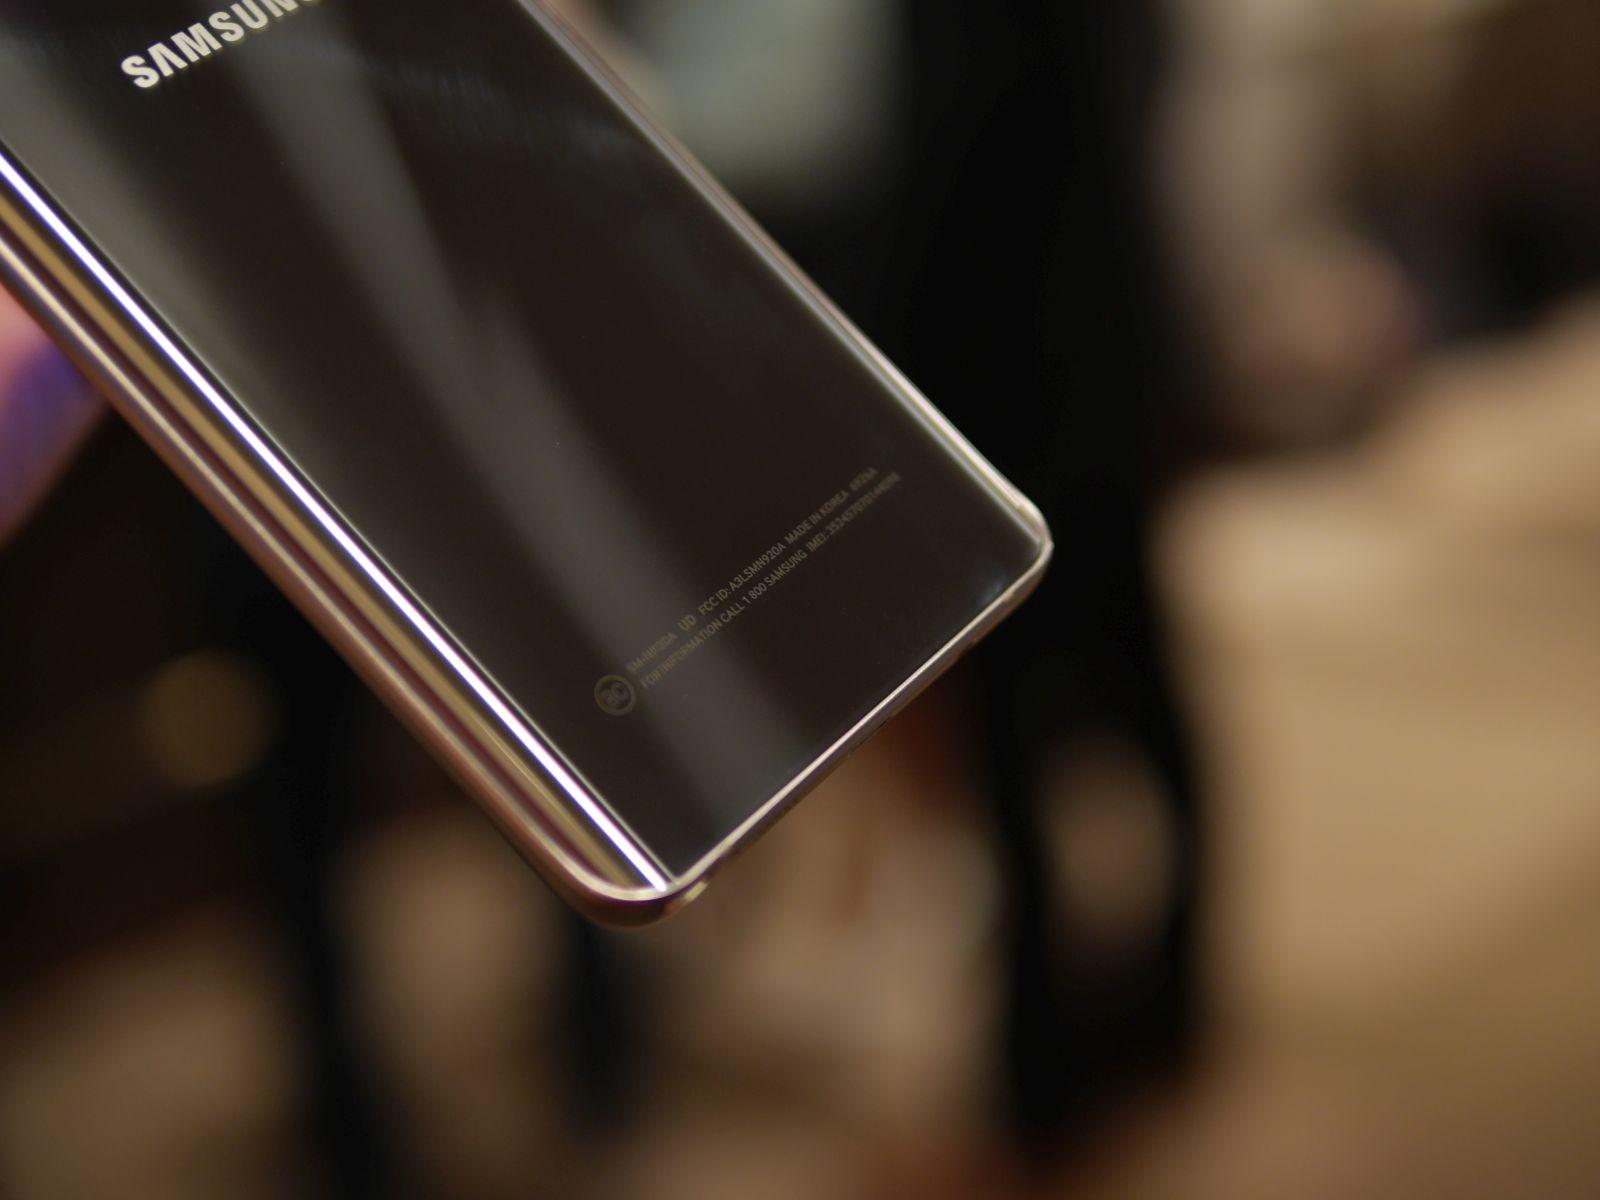 Samsung Galaxy S6 edge Plus 15